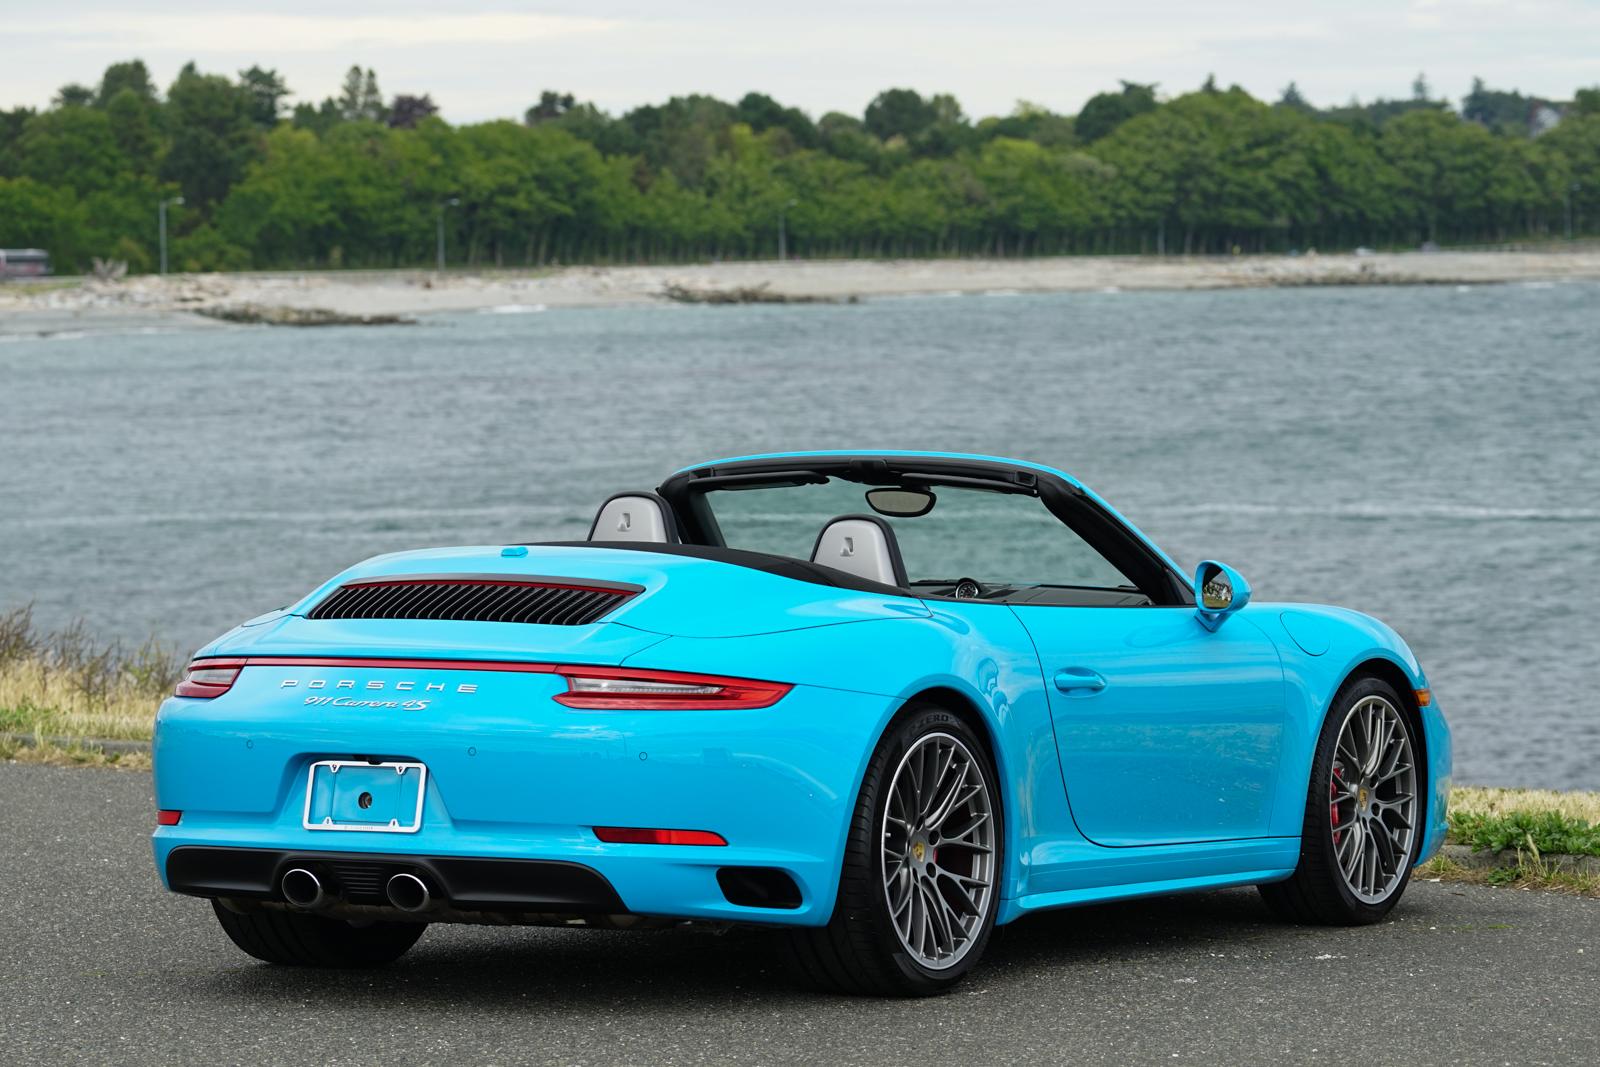 Porsche Experience Center >> 2017 Porsche 911 Carrera 4S Cabriolet For Sale | Silver Arrow Cars Ltd